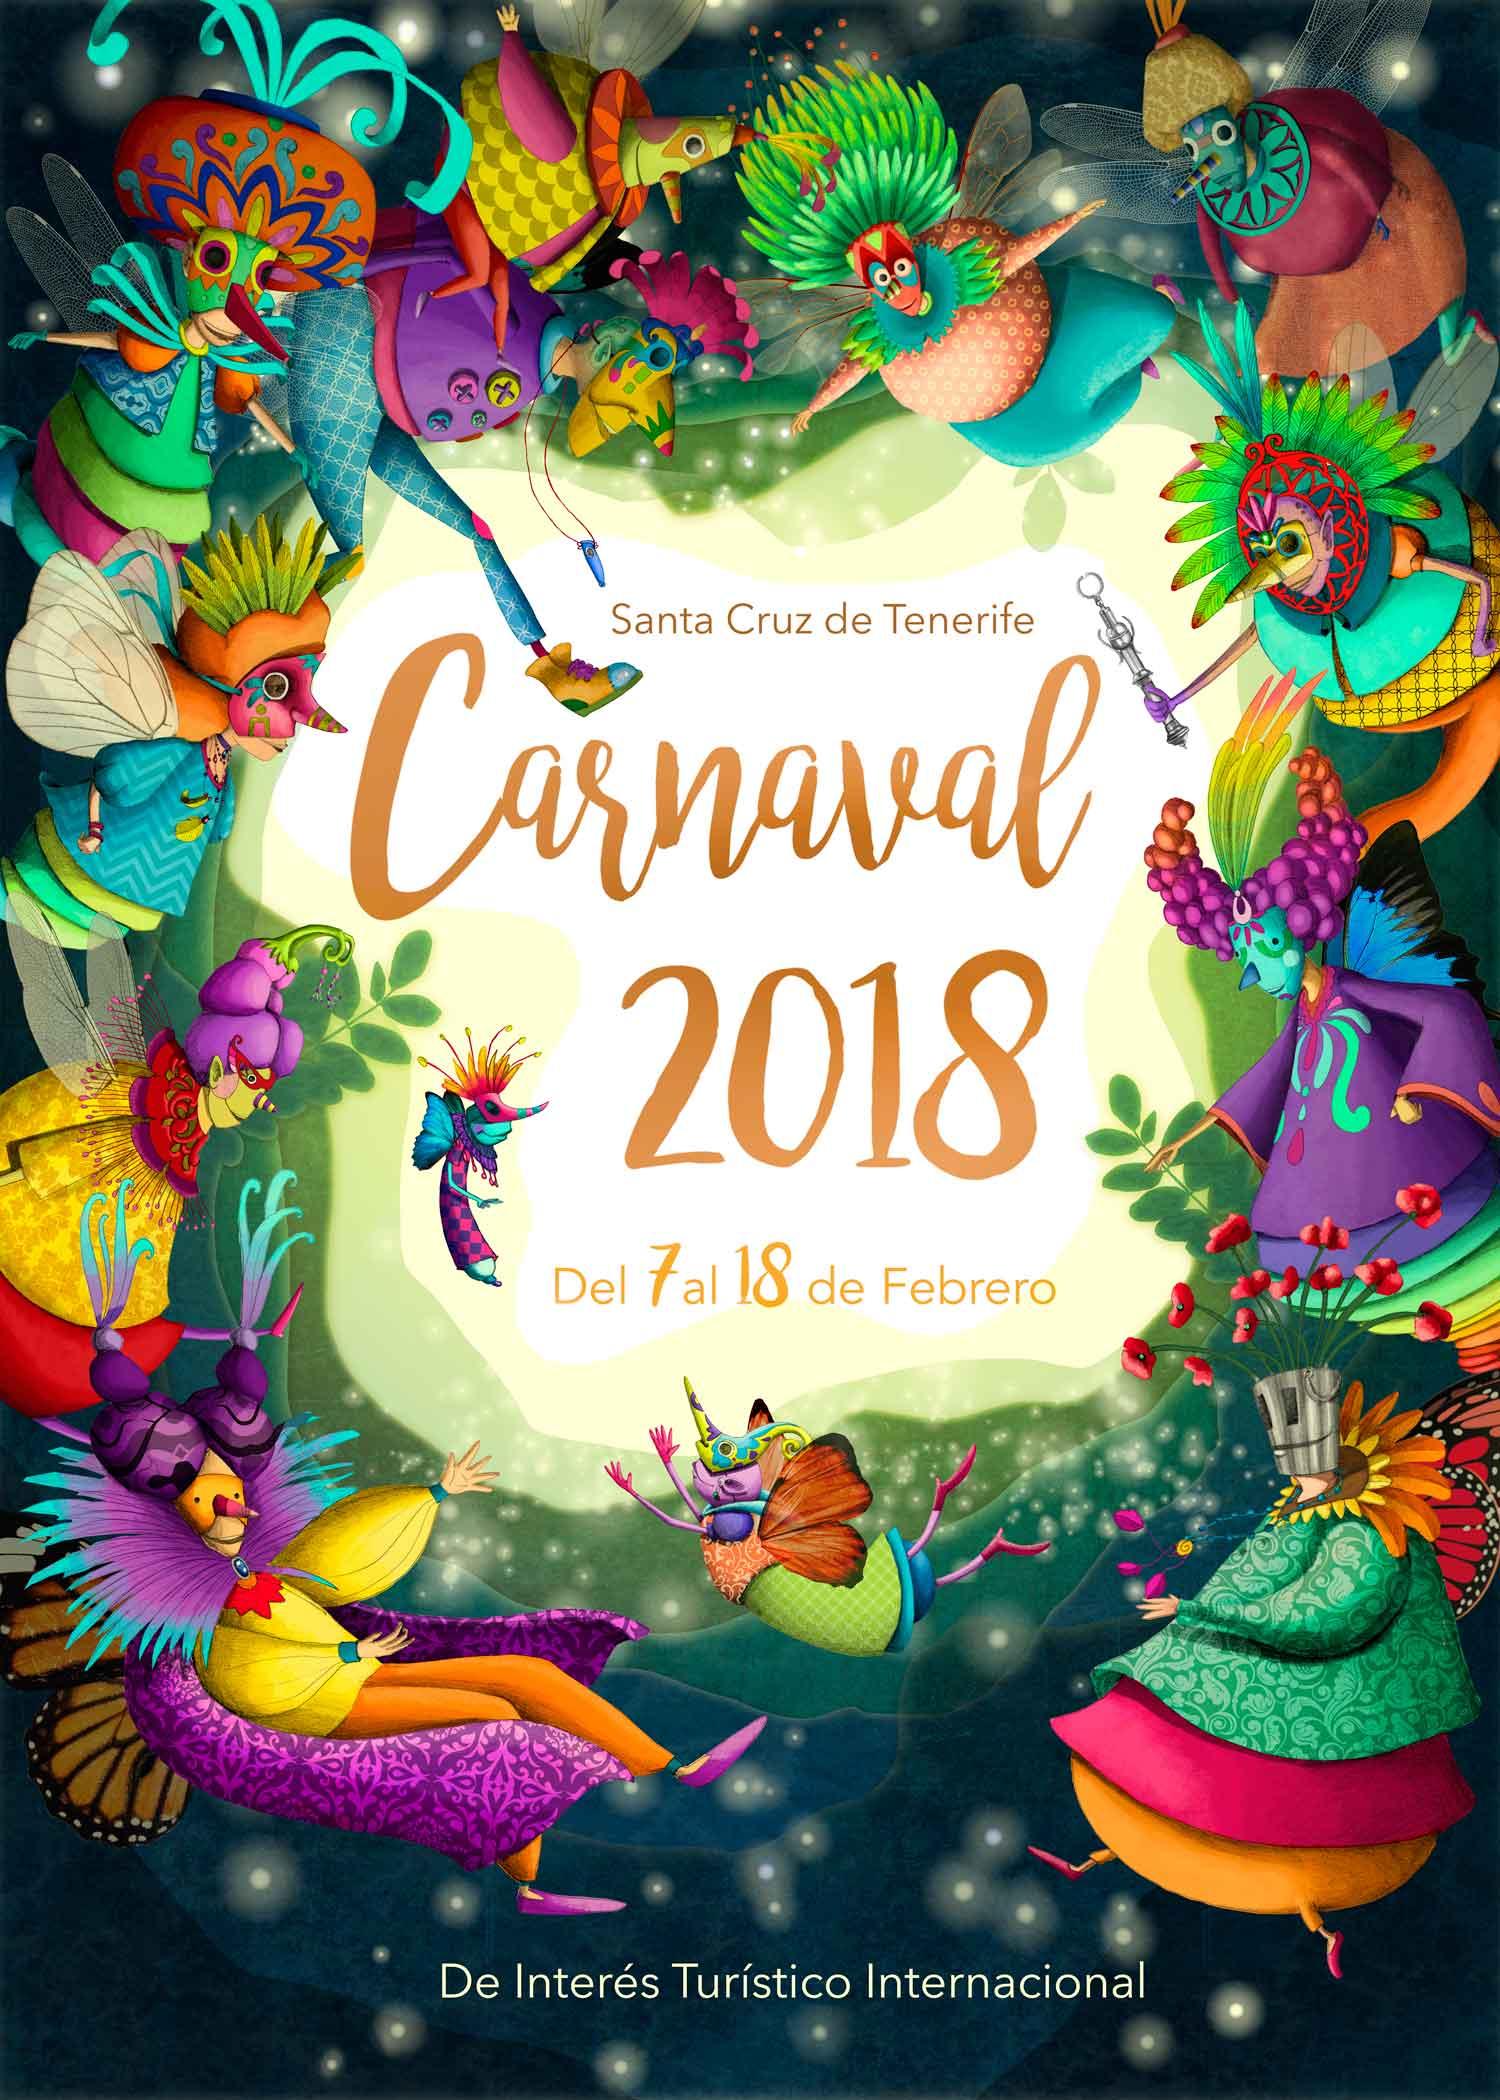 Официальная Афиша Карнавала в Санта-Крус-Де-Тенерифе 2018. Дизайнер Нареме Мелиана Махуго.